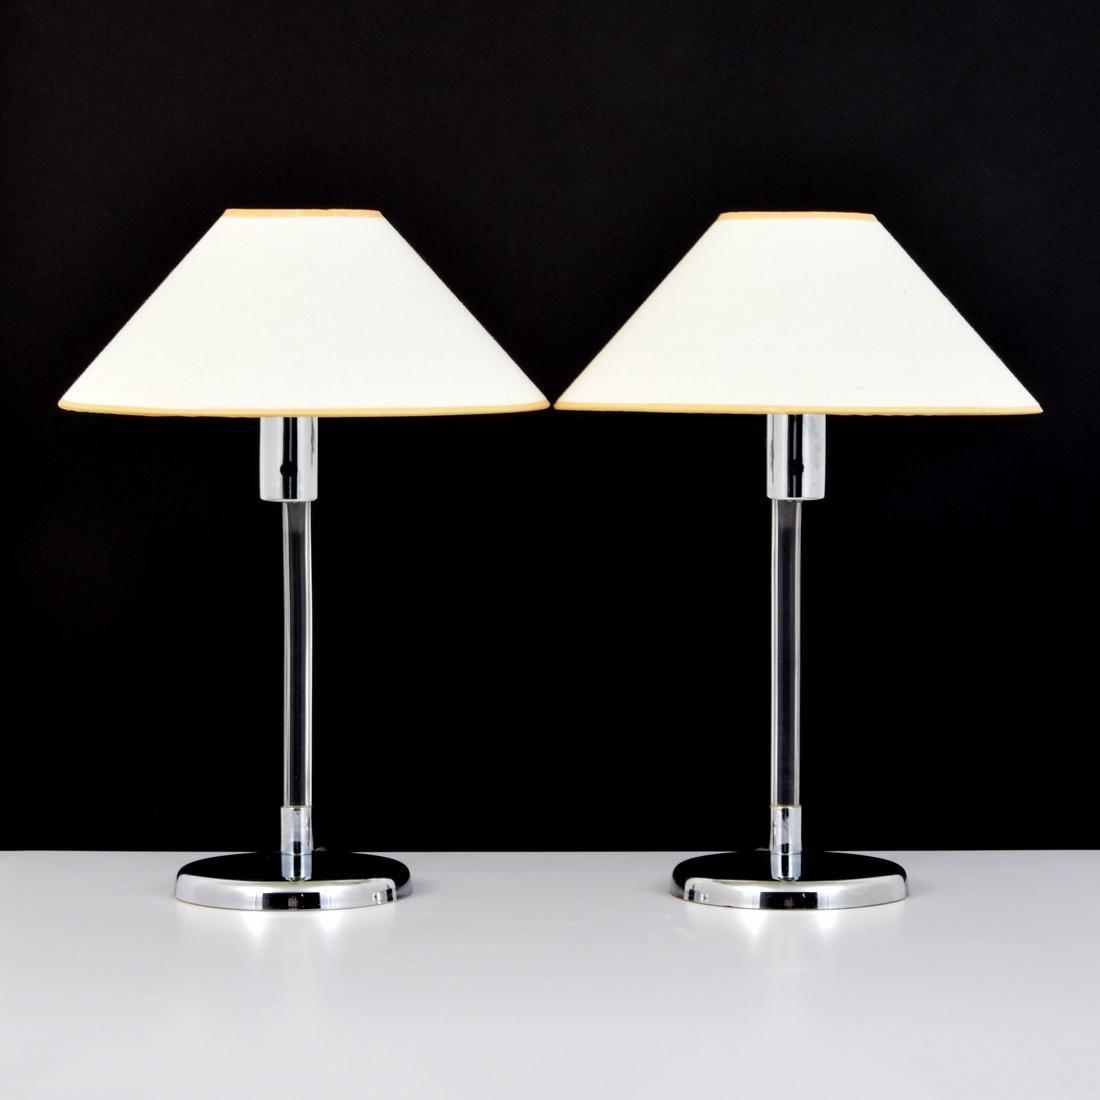 Pair of Peter Hamburger Lamps - 3